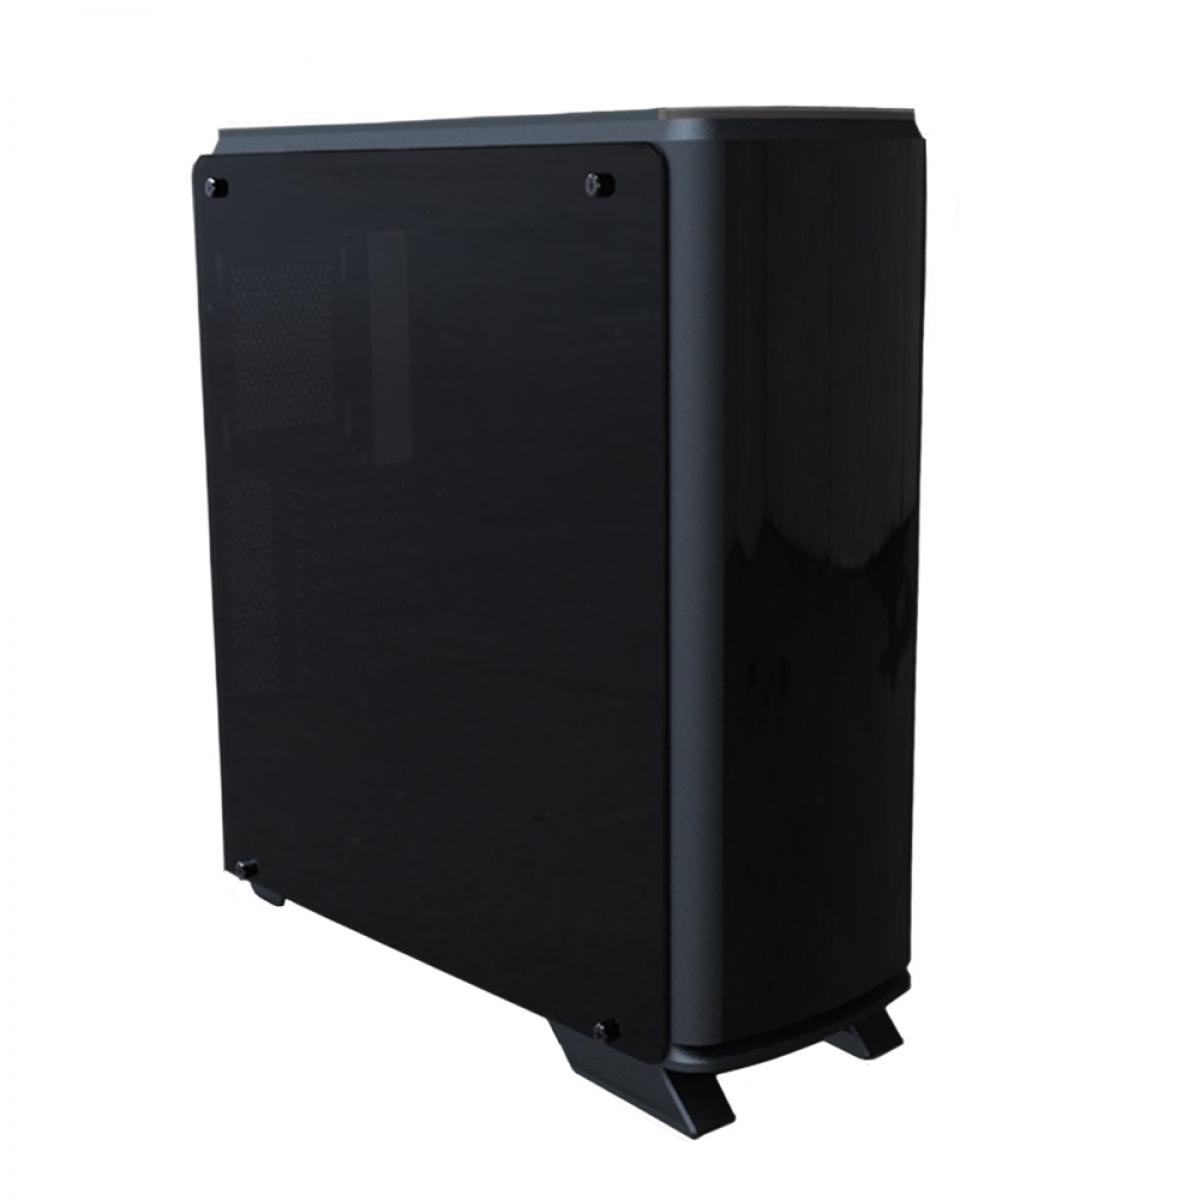 Gabinete Gamer Bluecase BG-007, Mid Tower, S-Fan, Vidro Temperado, Black, S-Fonte